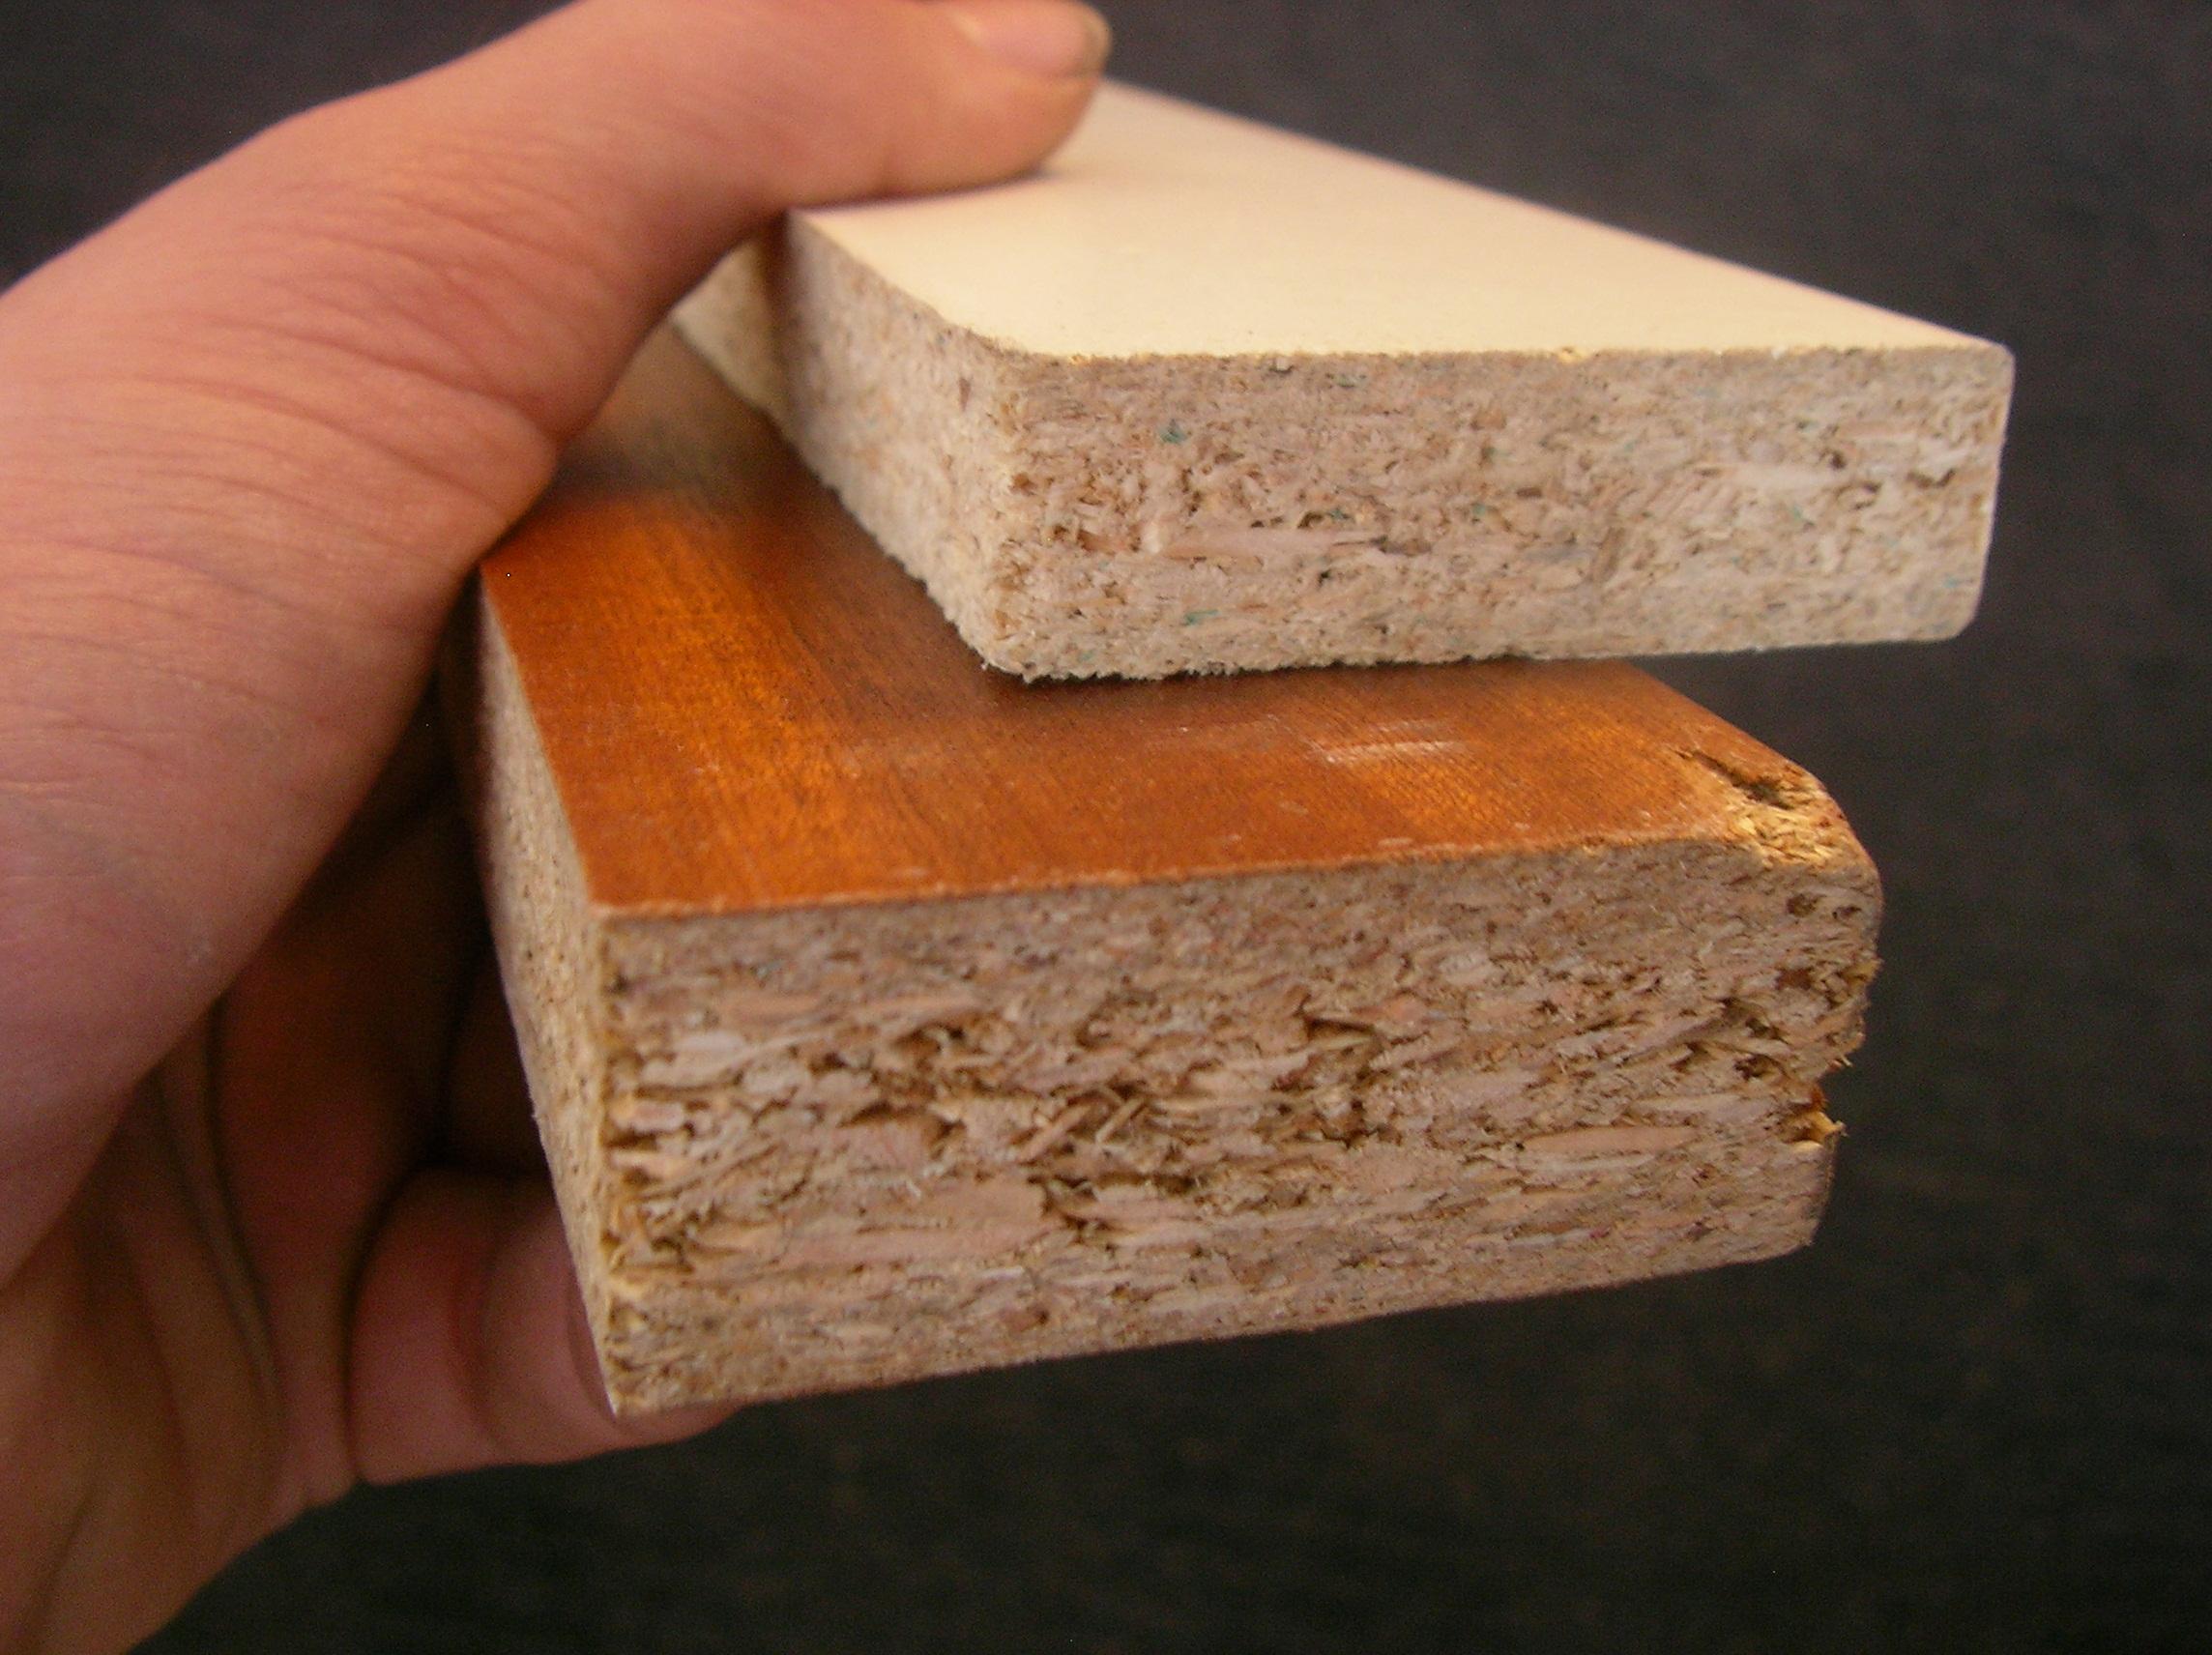 Formica Keuken Schilderen : Laminate Wood vs Particleboard